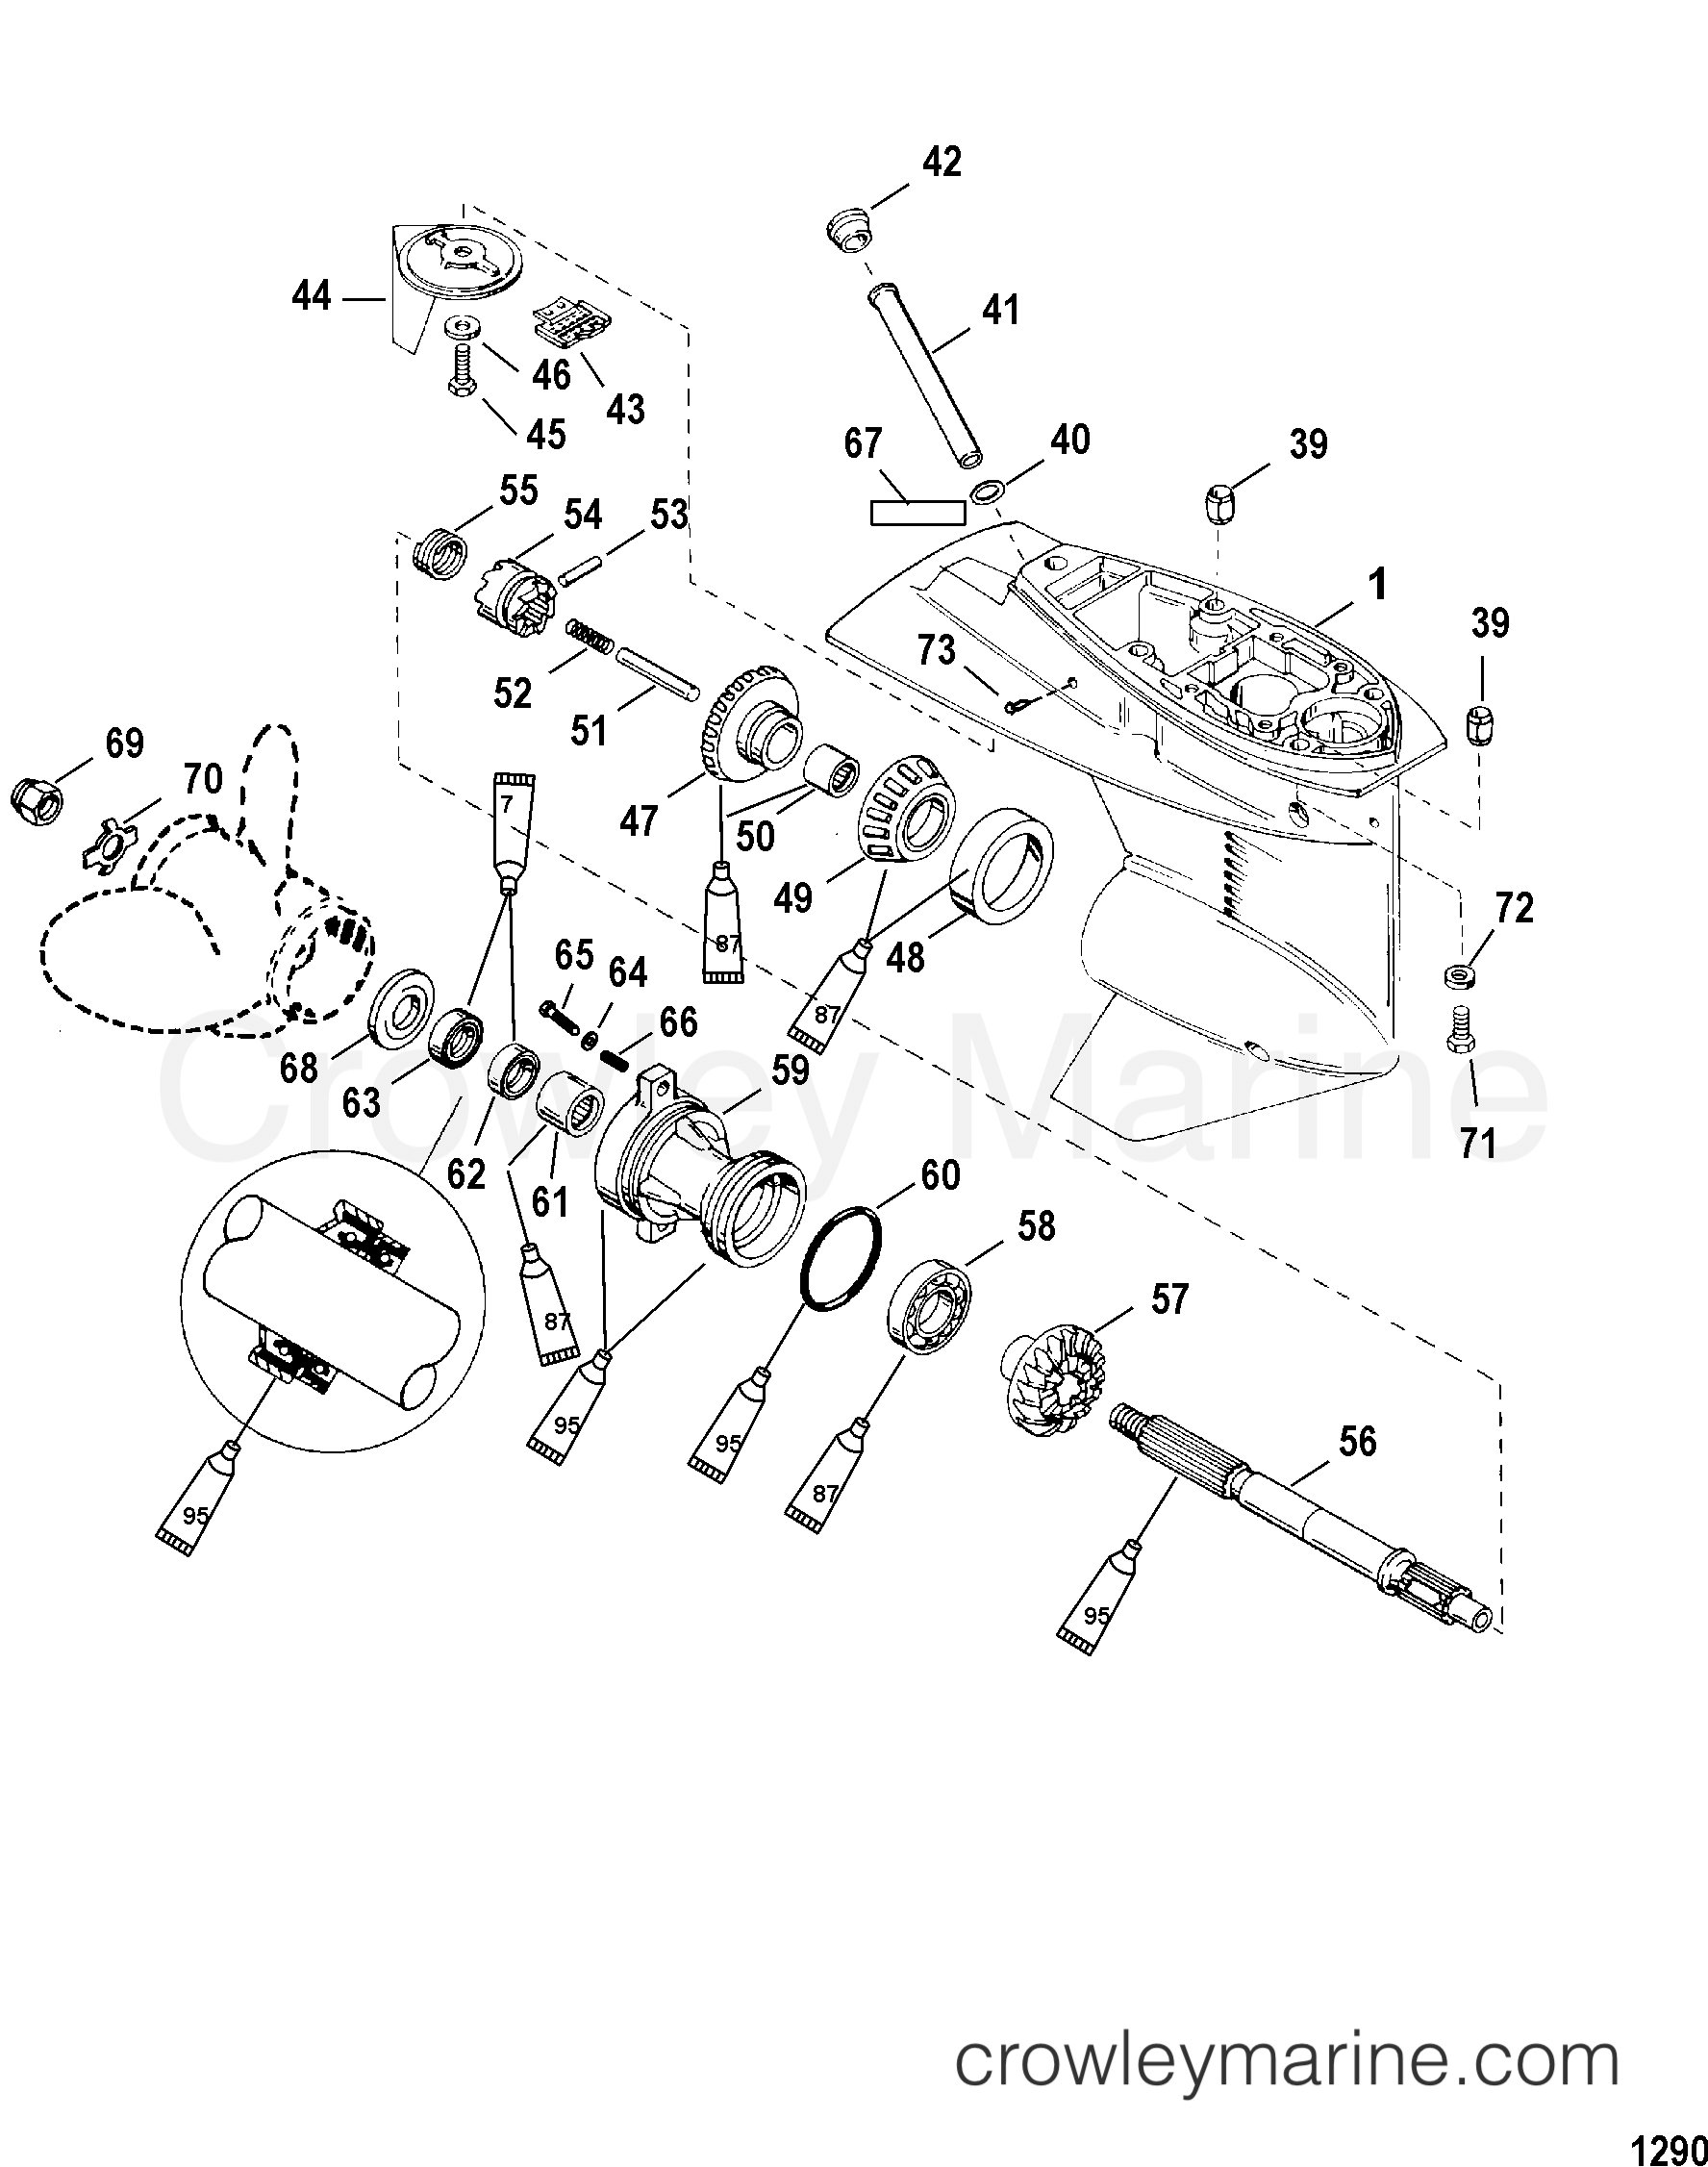 2004 Mercury Outboard 25 [EL/BF 4] - 1F25312CB GEAR HOUSING(PROPELLER SHAFT)(2.41:1 GEAR RATIO) section